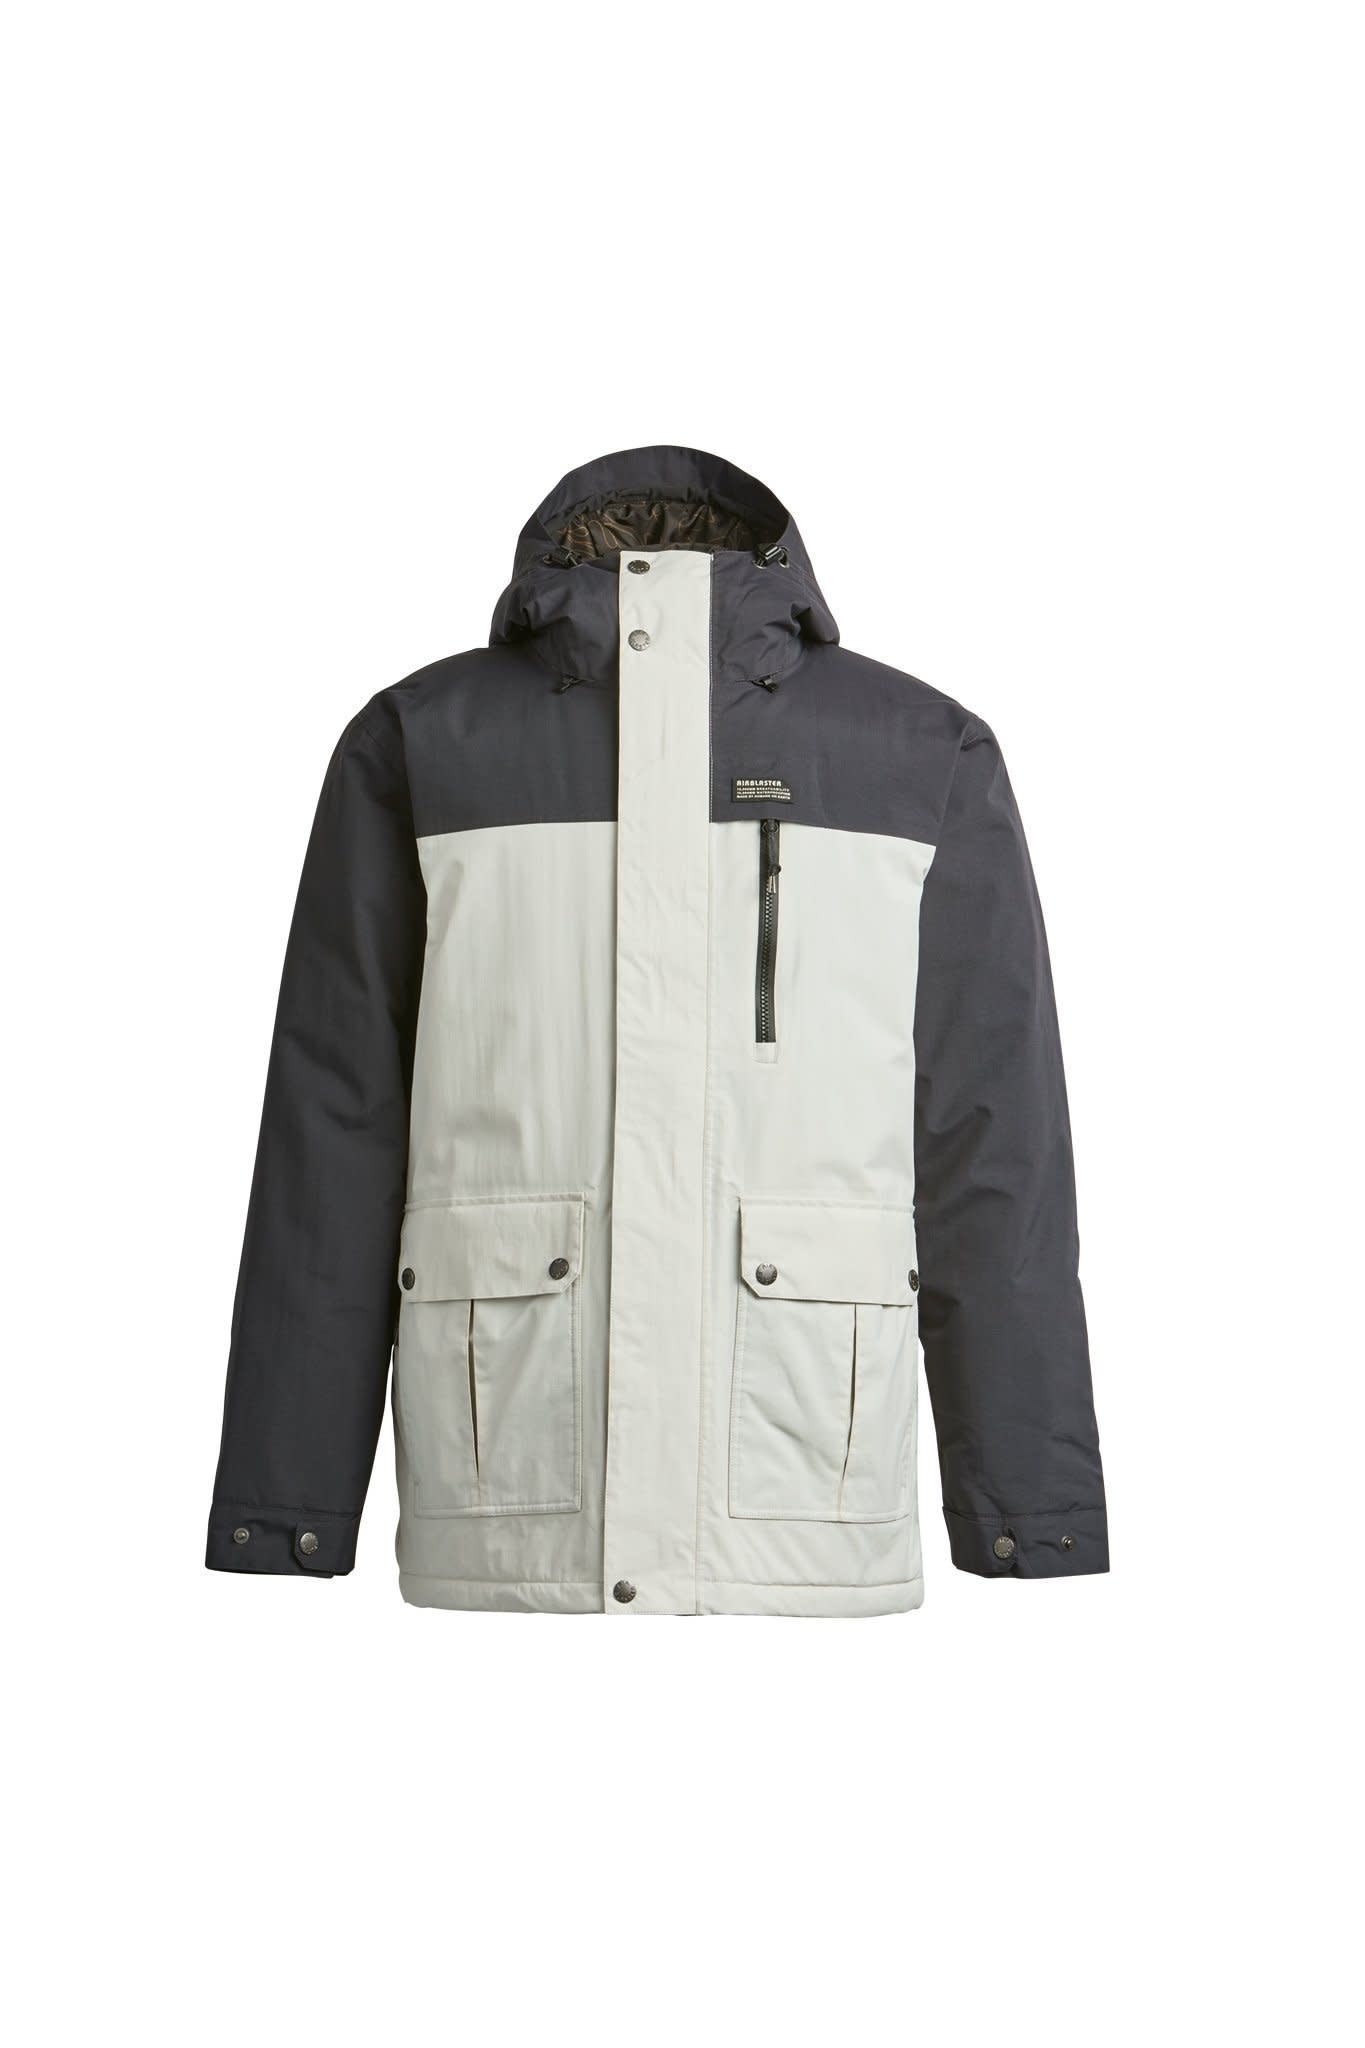 Airblaster Airblaster Men's Grampy 3000 Jacket